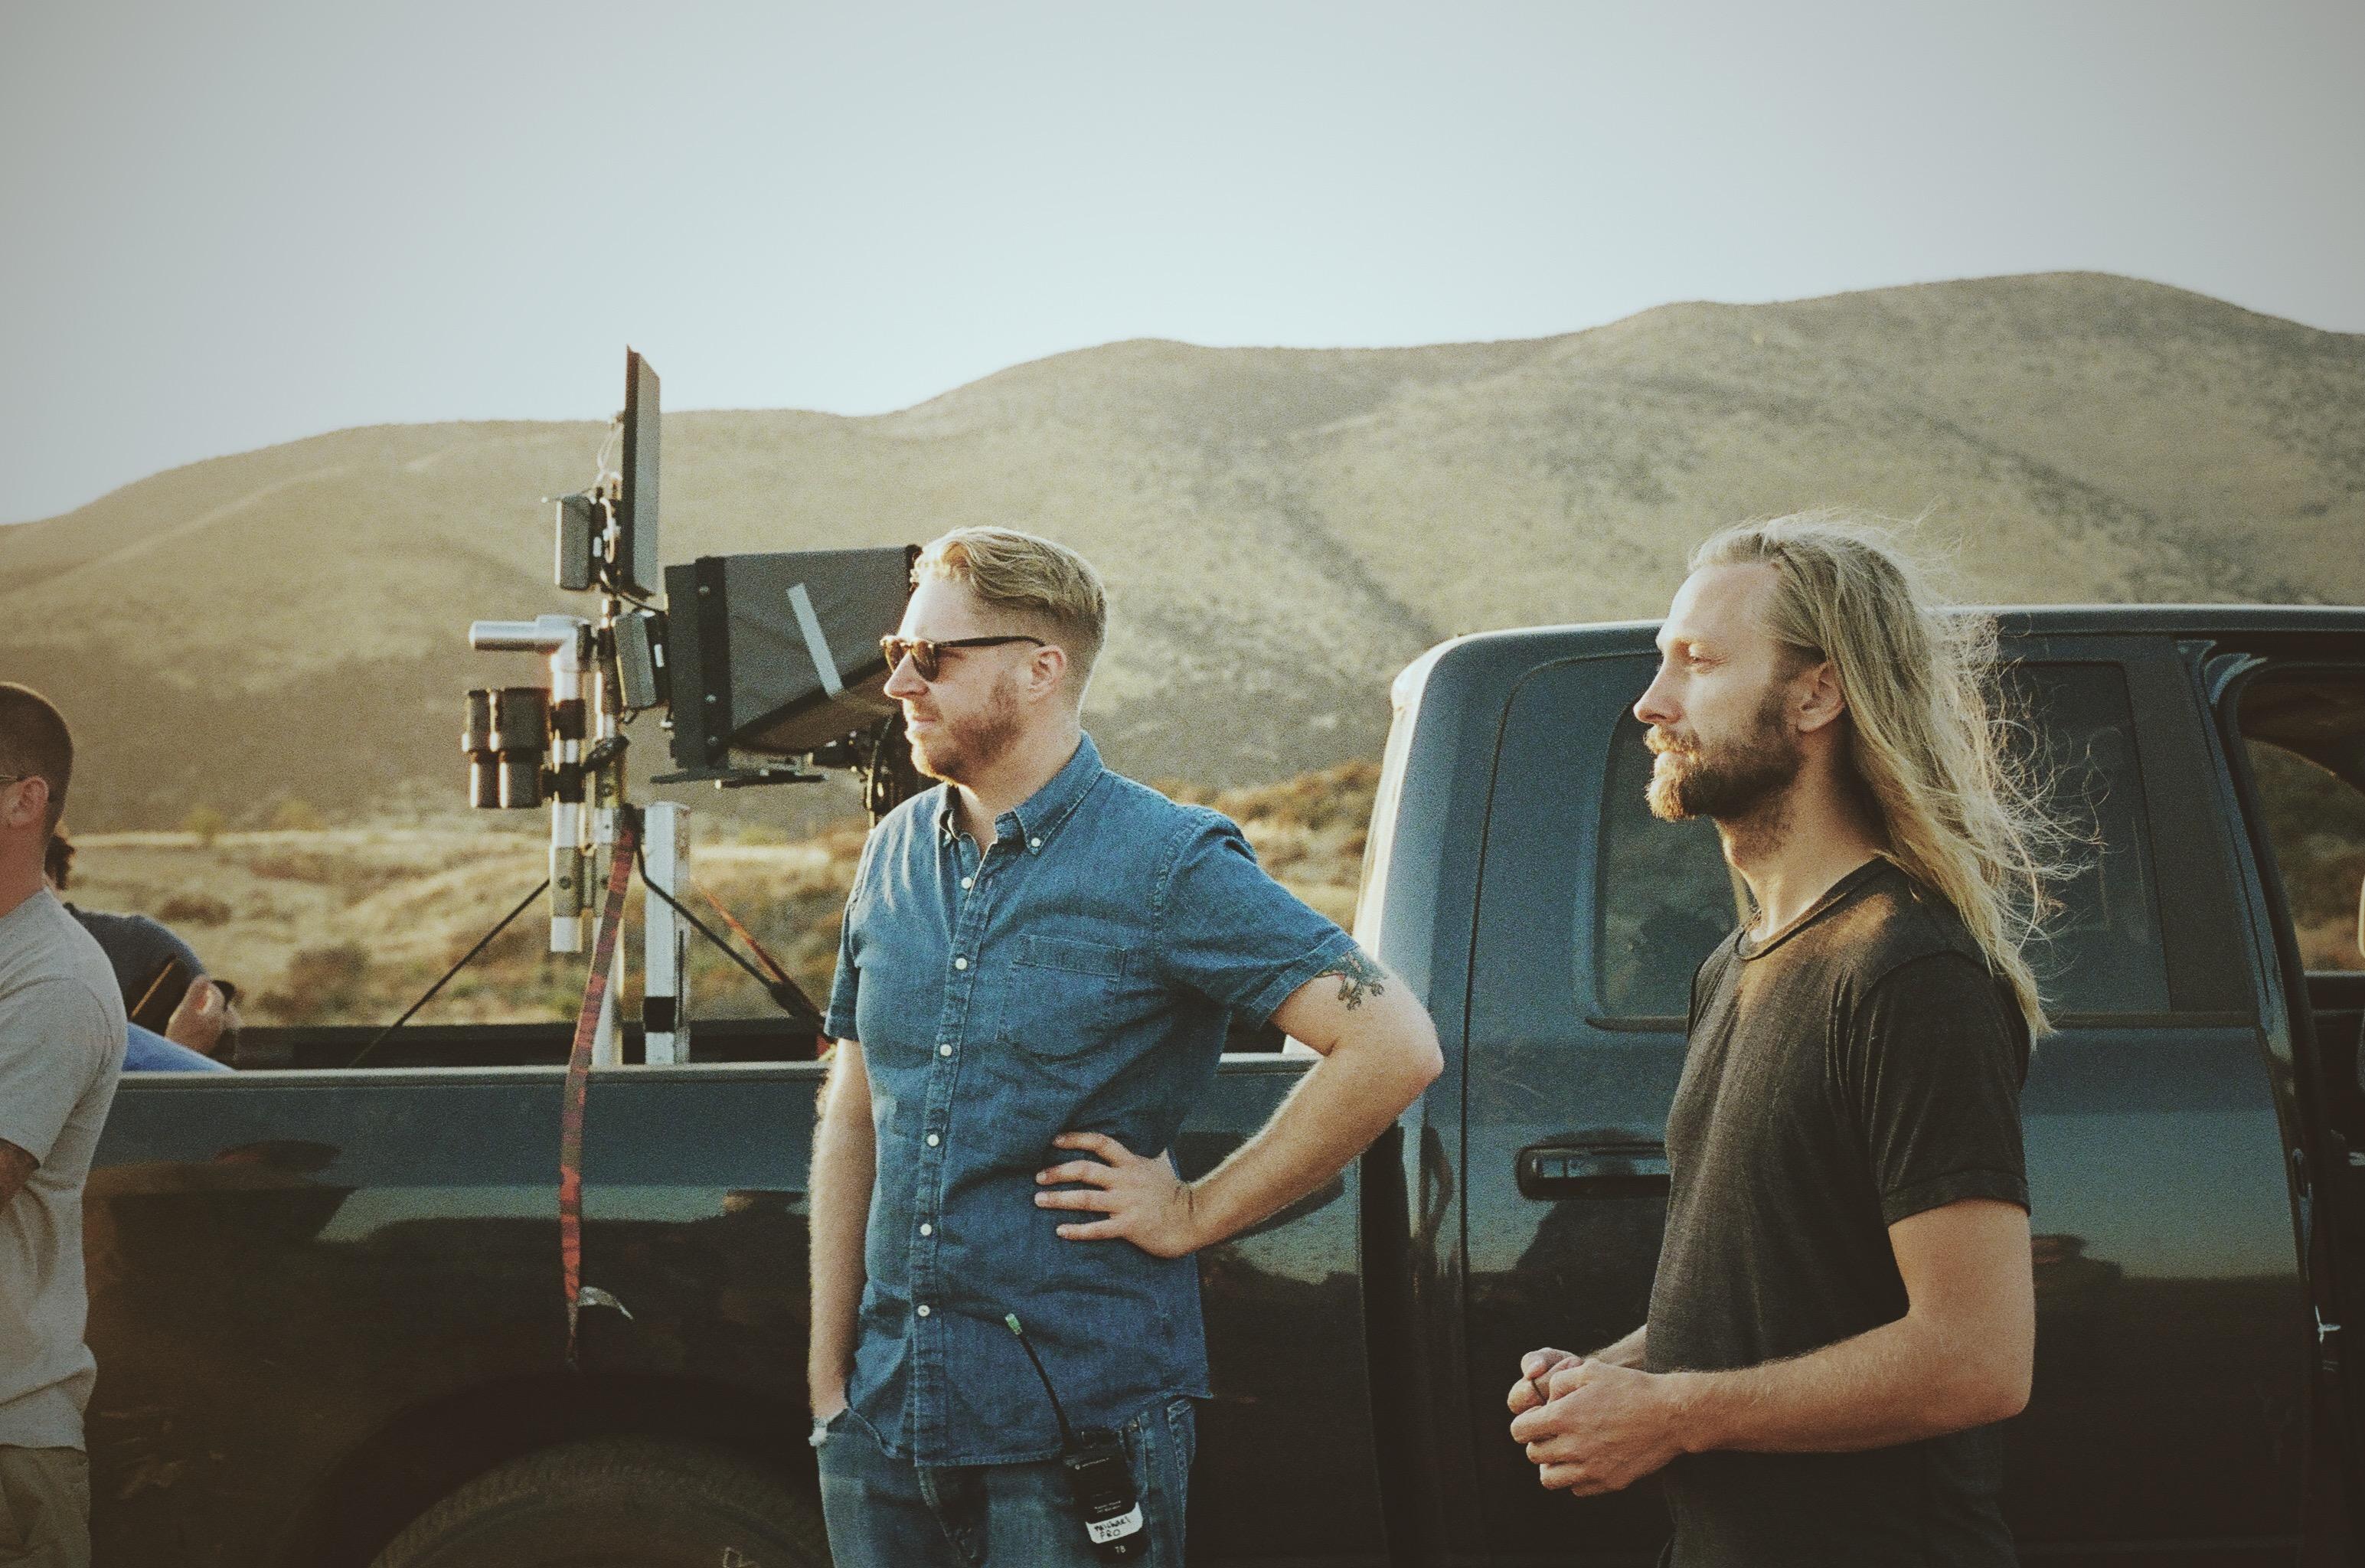 Director Benjamin Kutsko uses light drones in Australian band's, Pnau, music video.